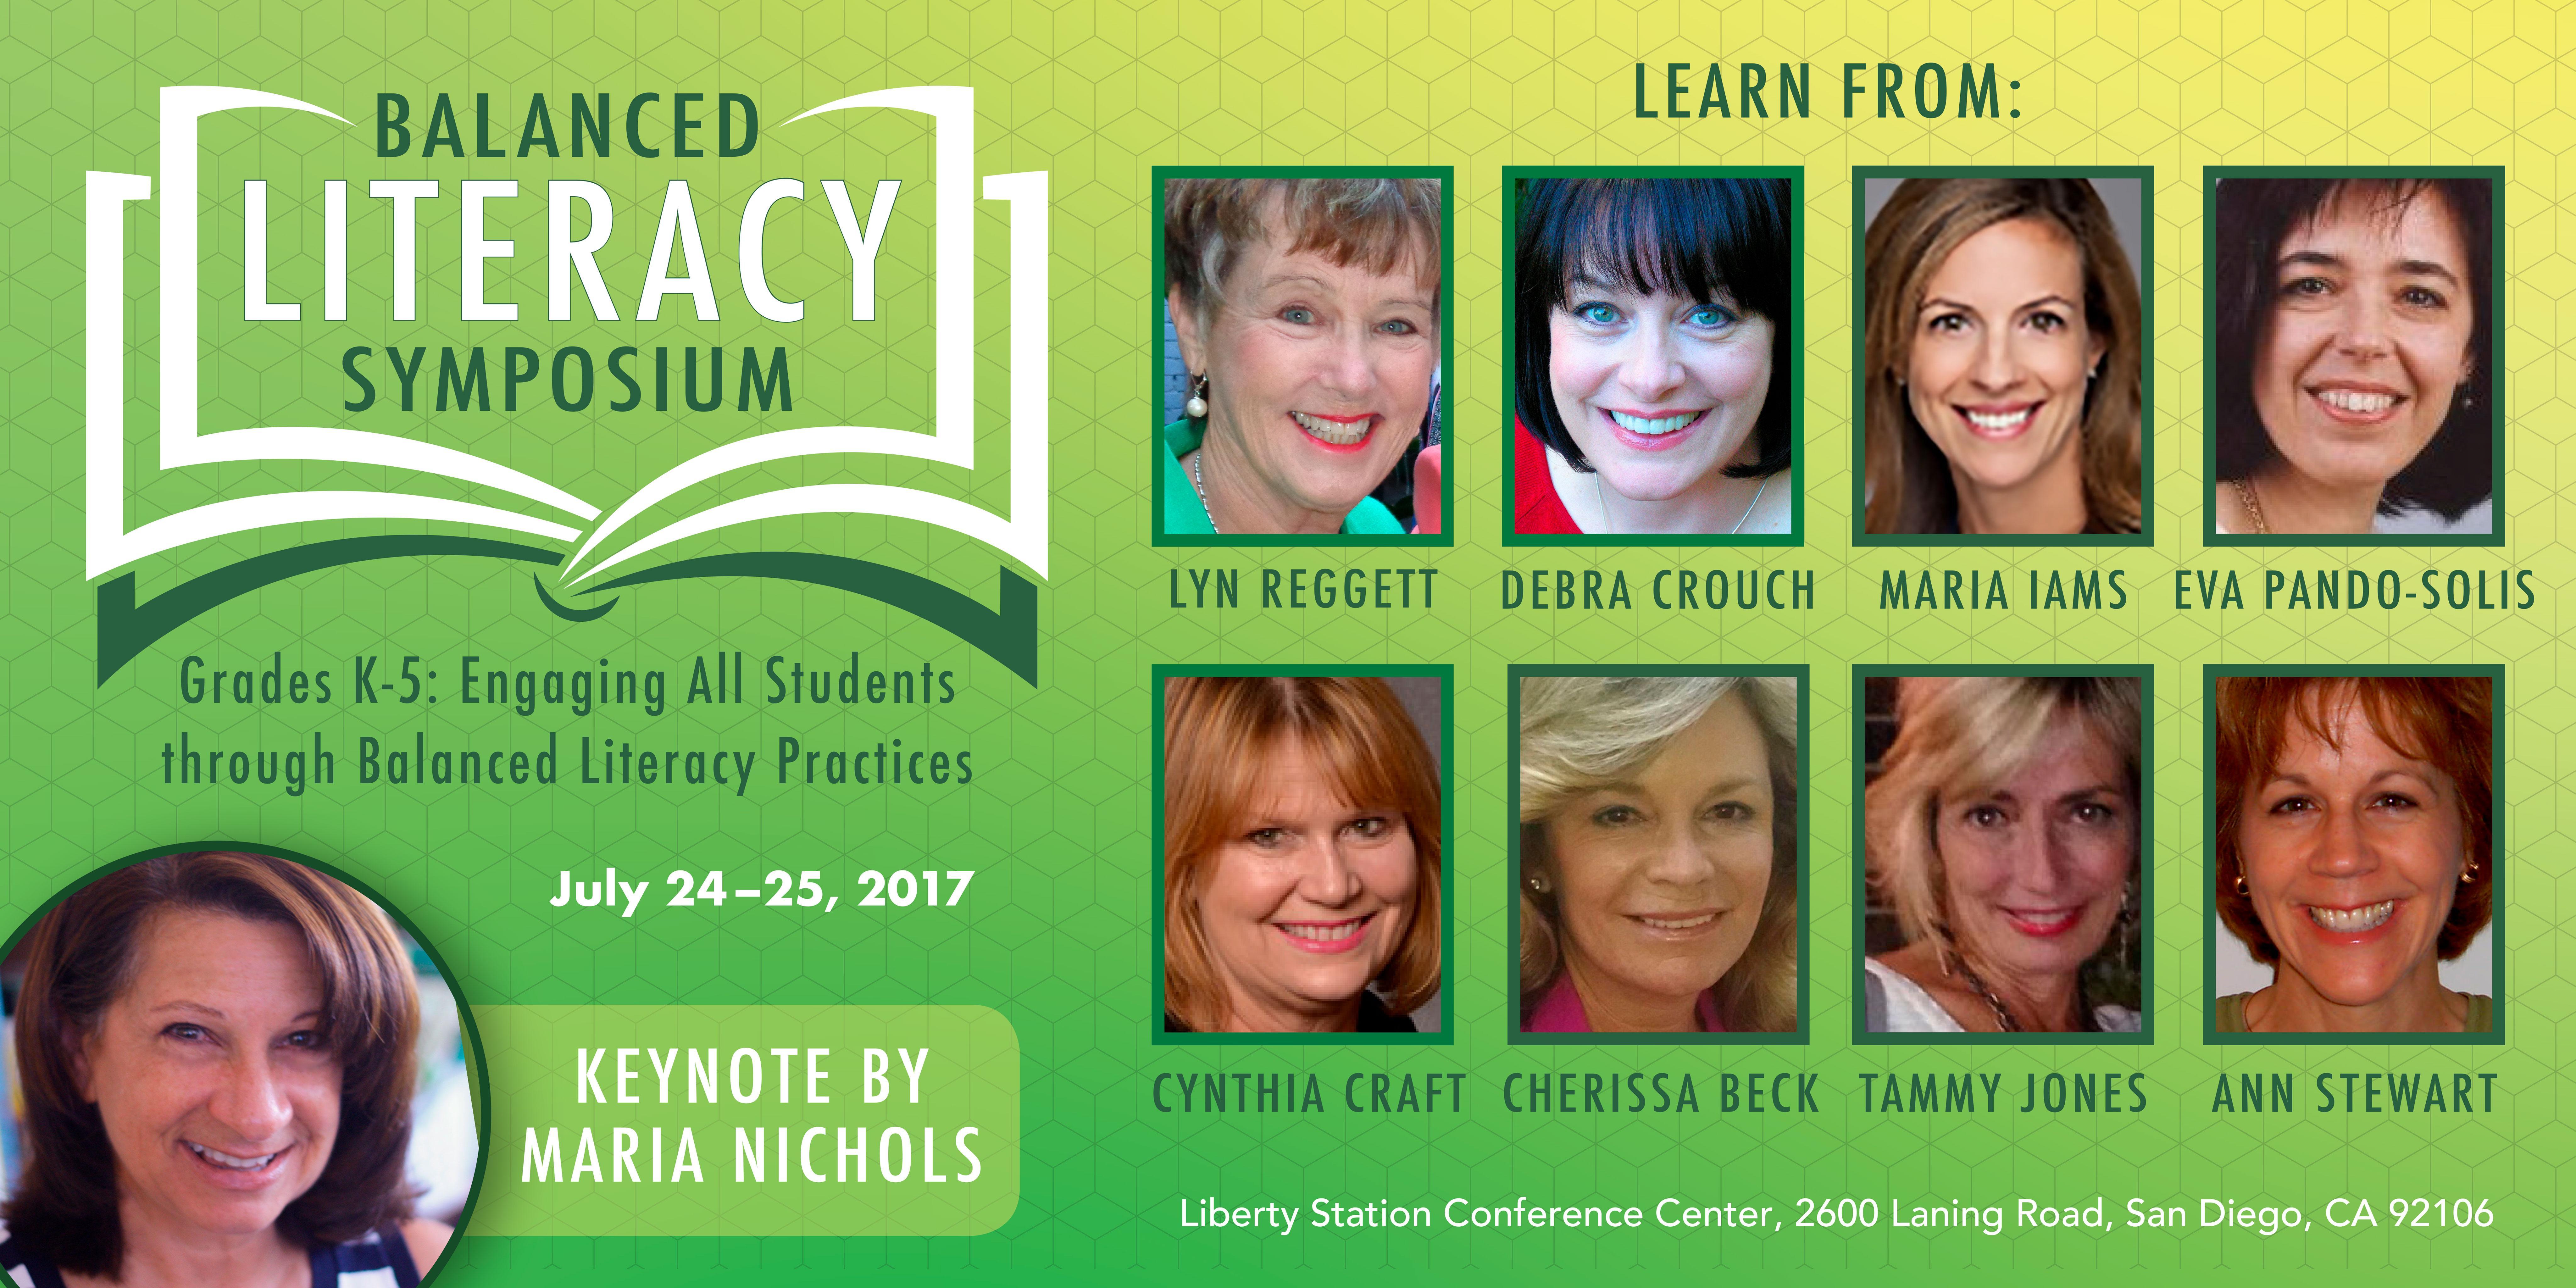 Balanced Literacy Symposium